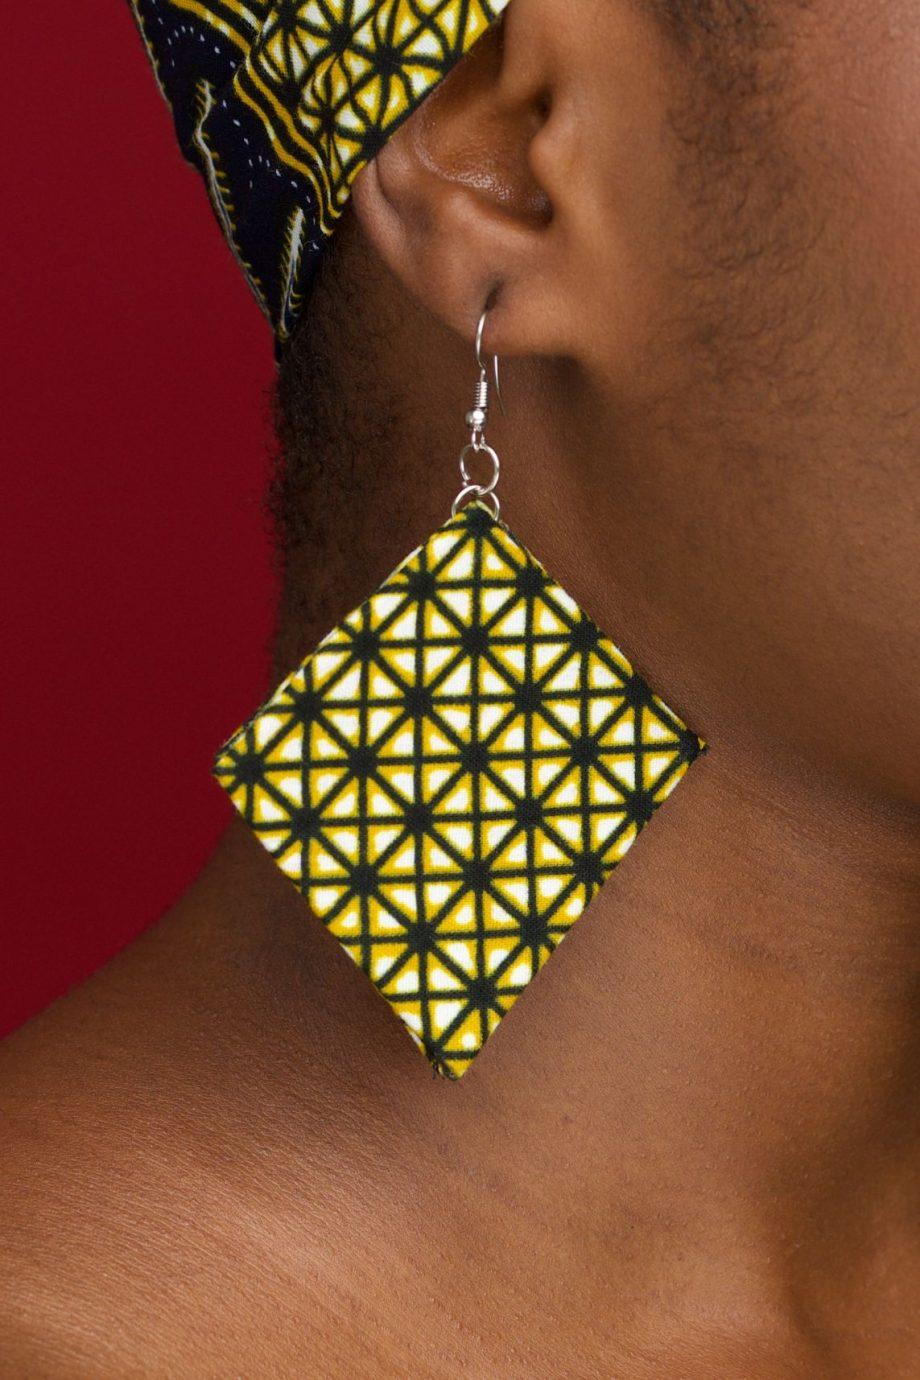 Yellow Diamond Shaped Ankara Earrings - KETA by Naborhi - KETA